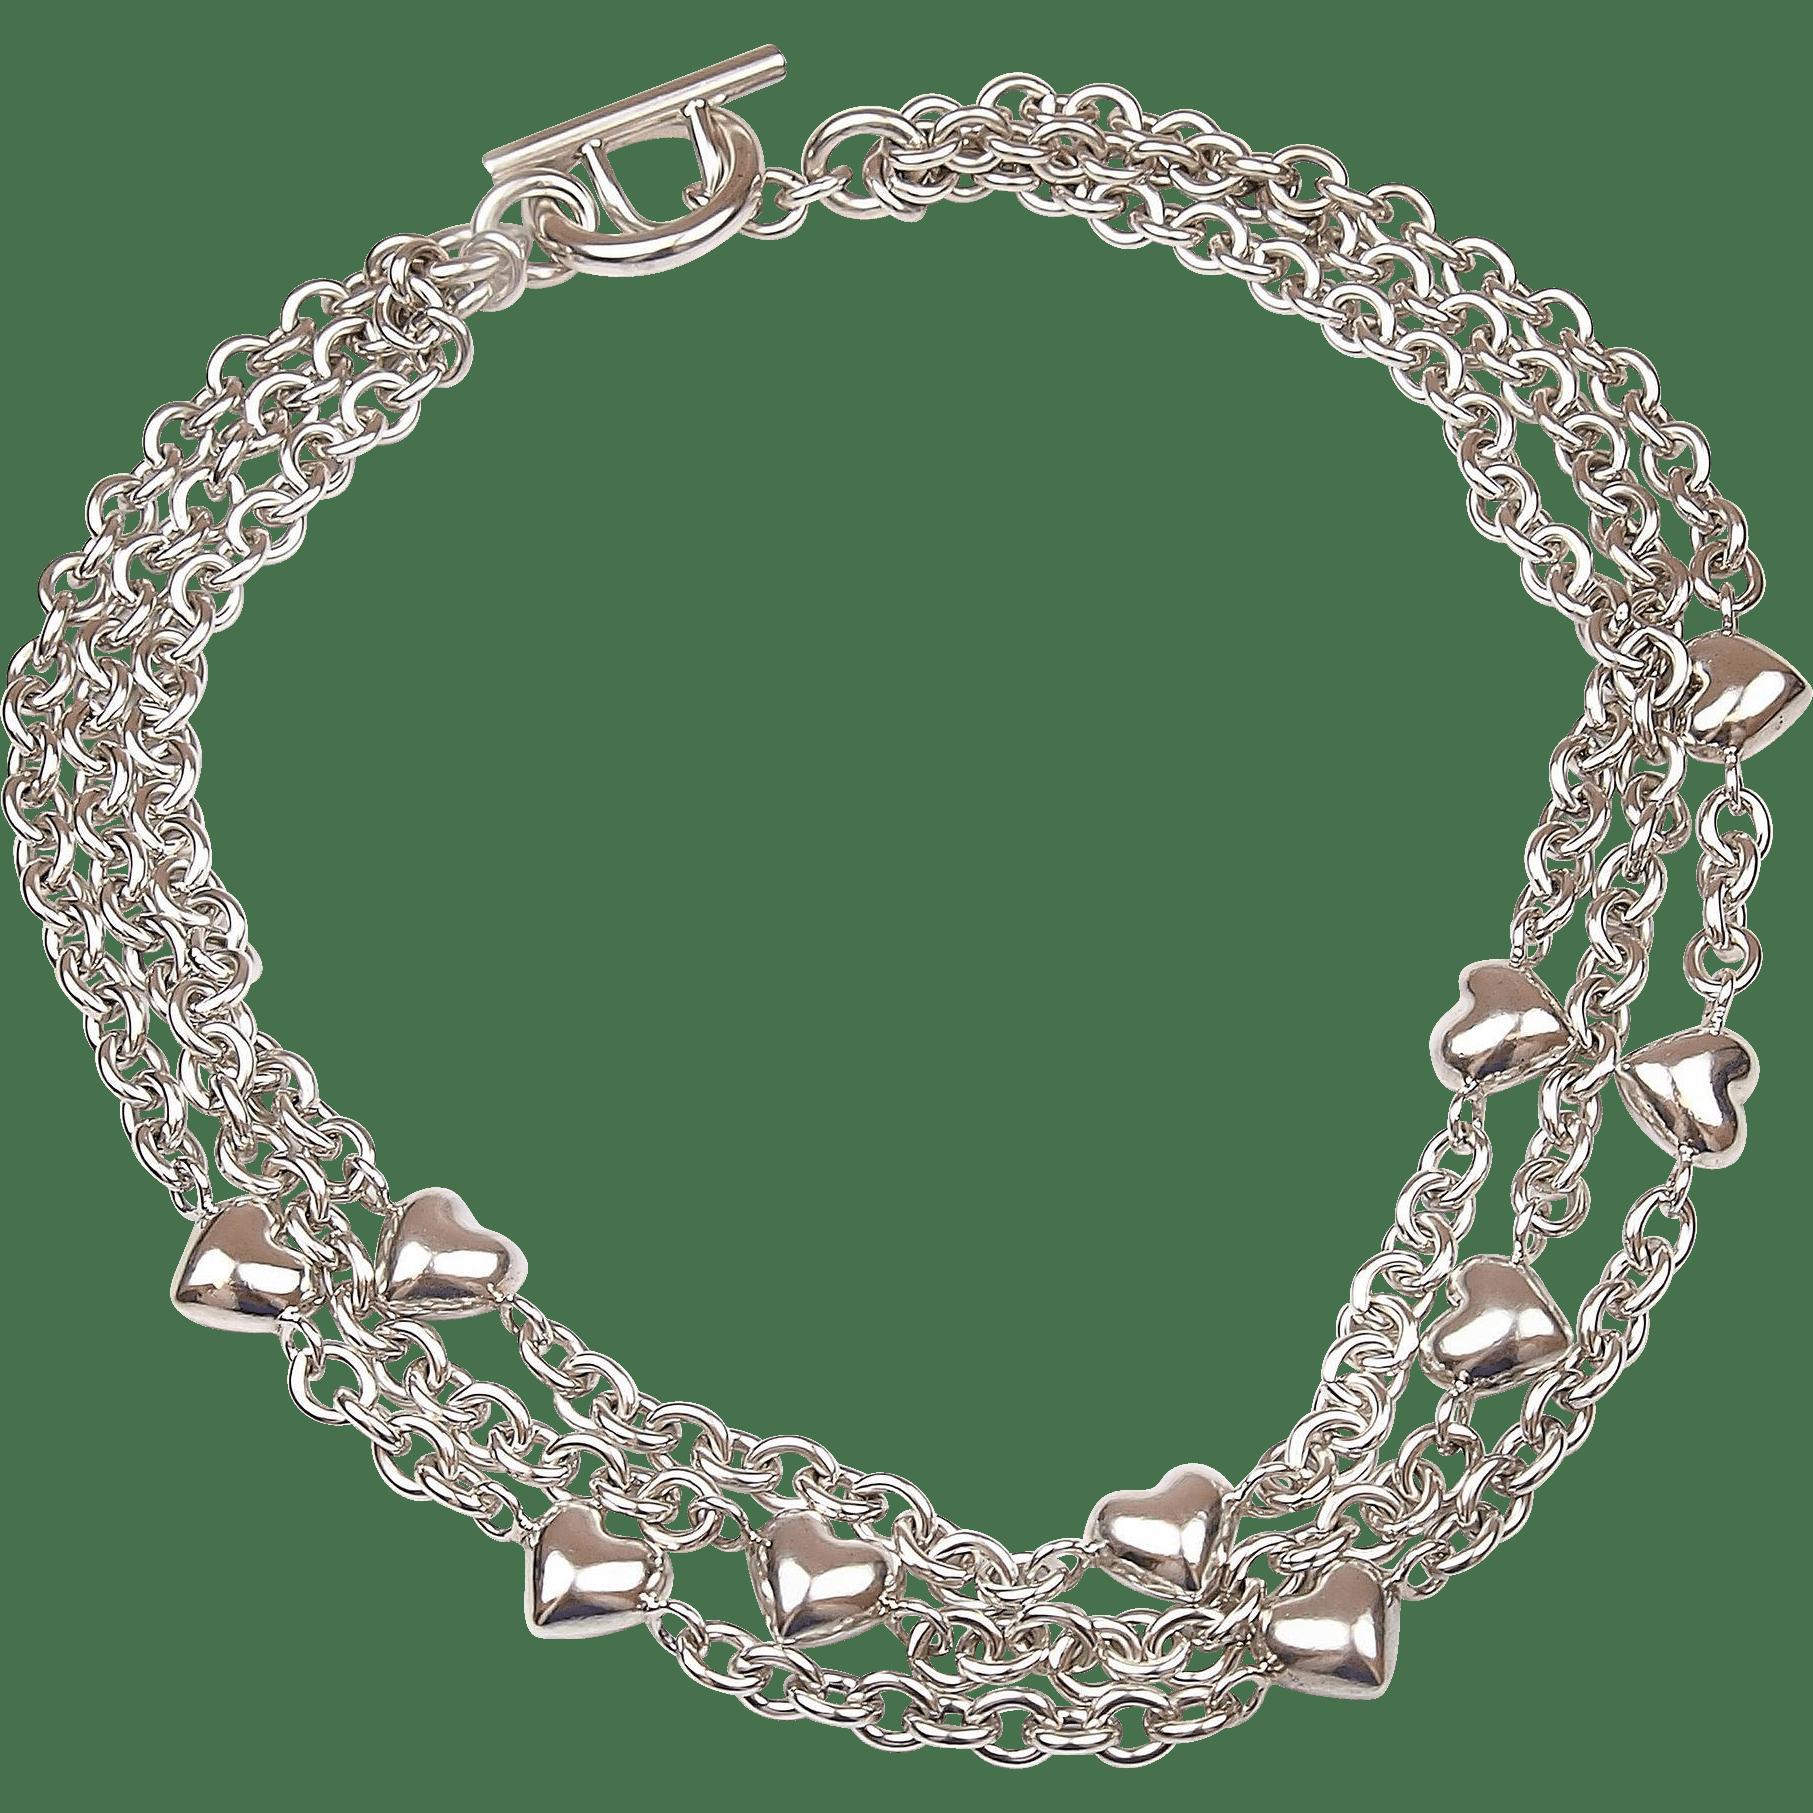 Heart chain clipart vector transparent download Tiffany Heart Necklace - clipart vector transparent download